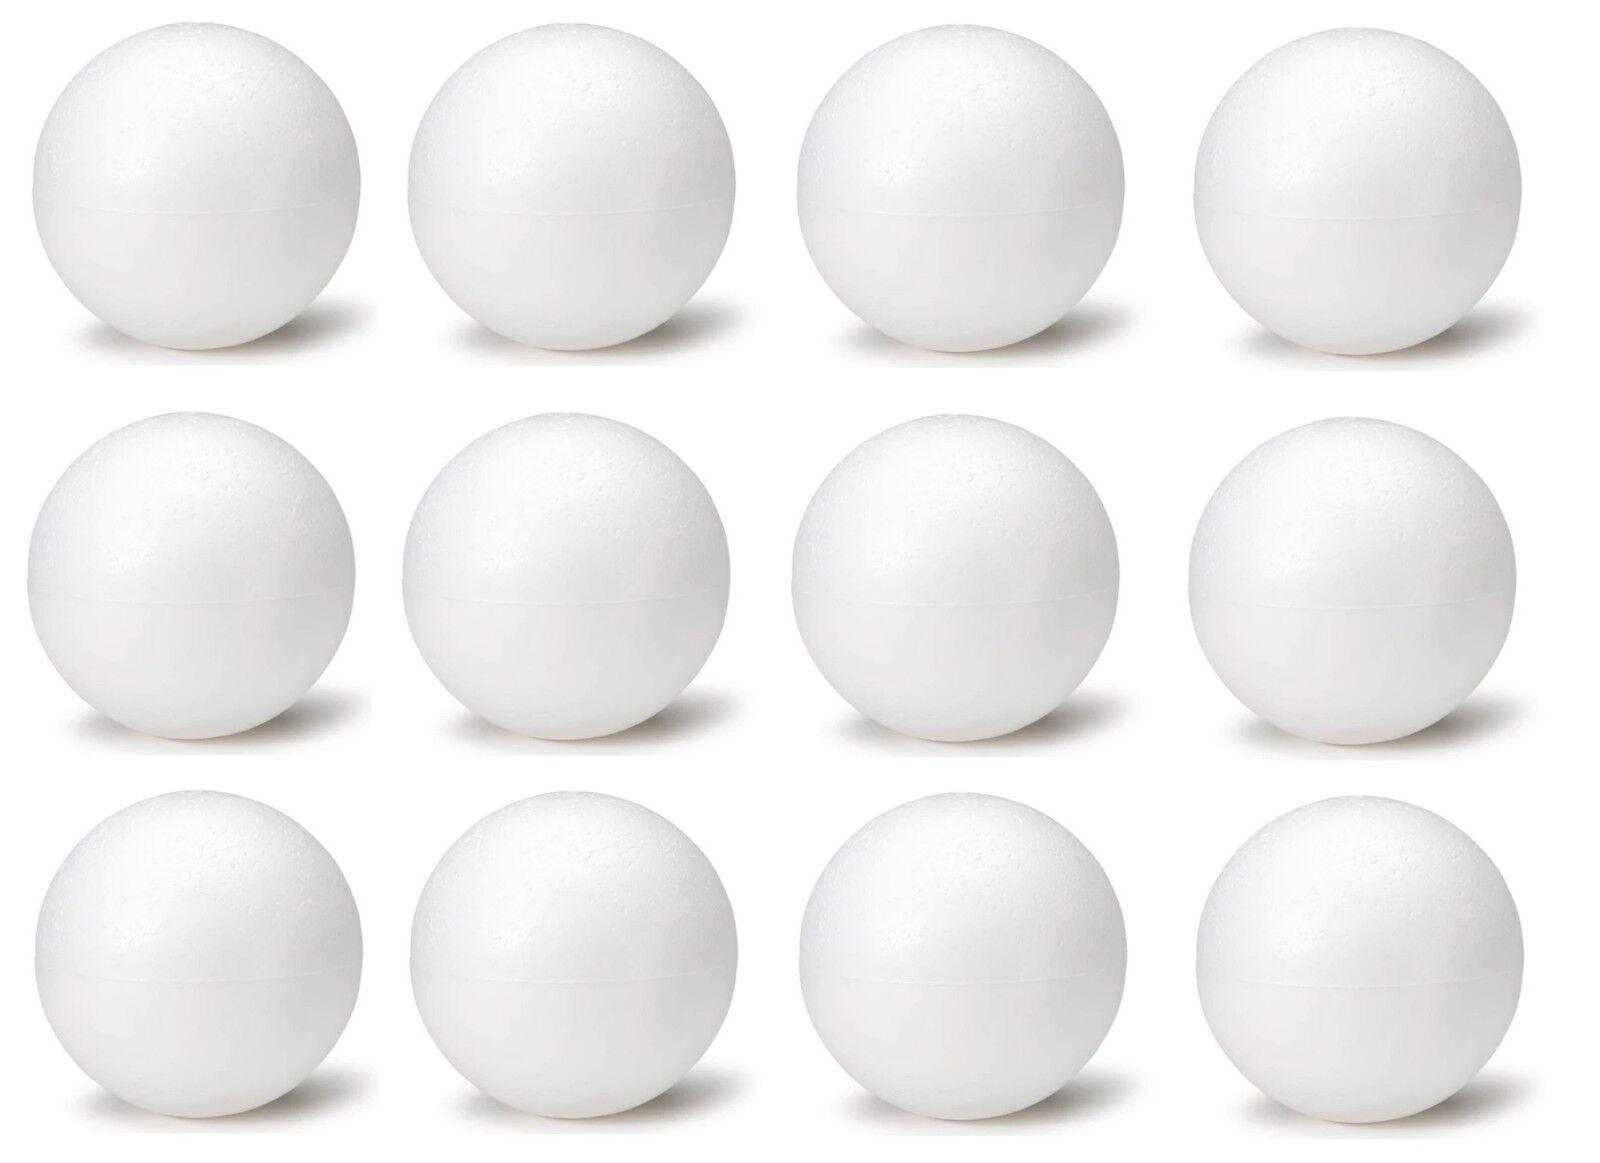 4-8cm Half-round Polystyrene Foam Balls for DIY Christmas Kids Craft Painted